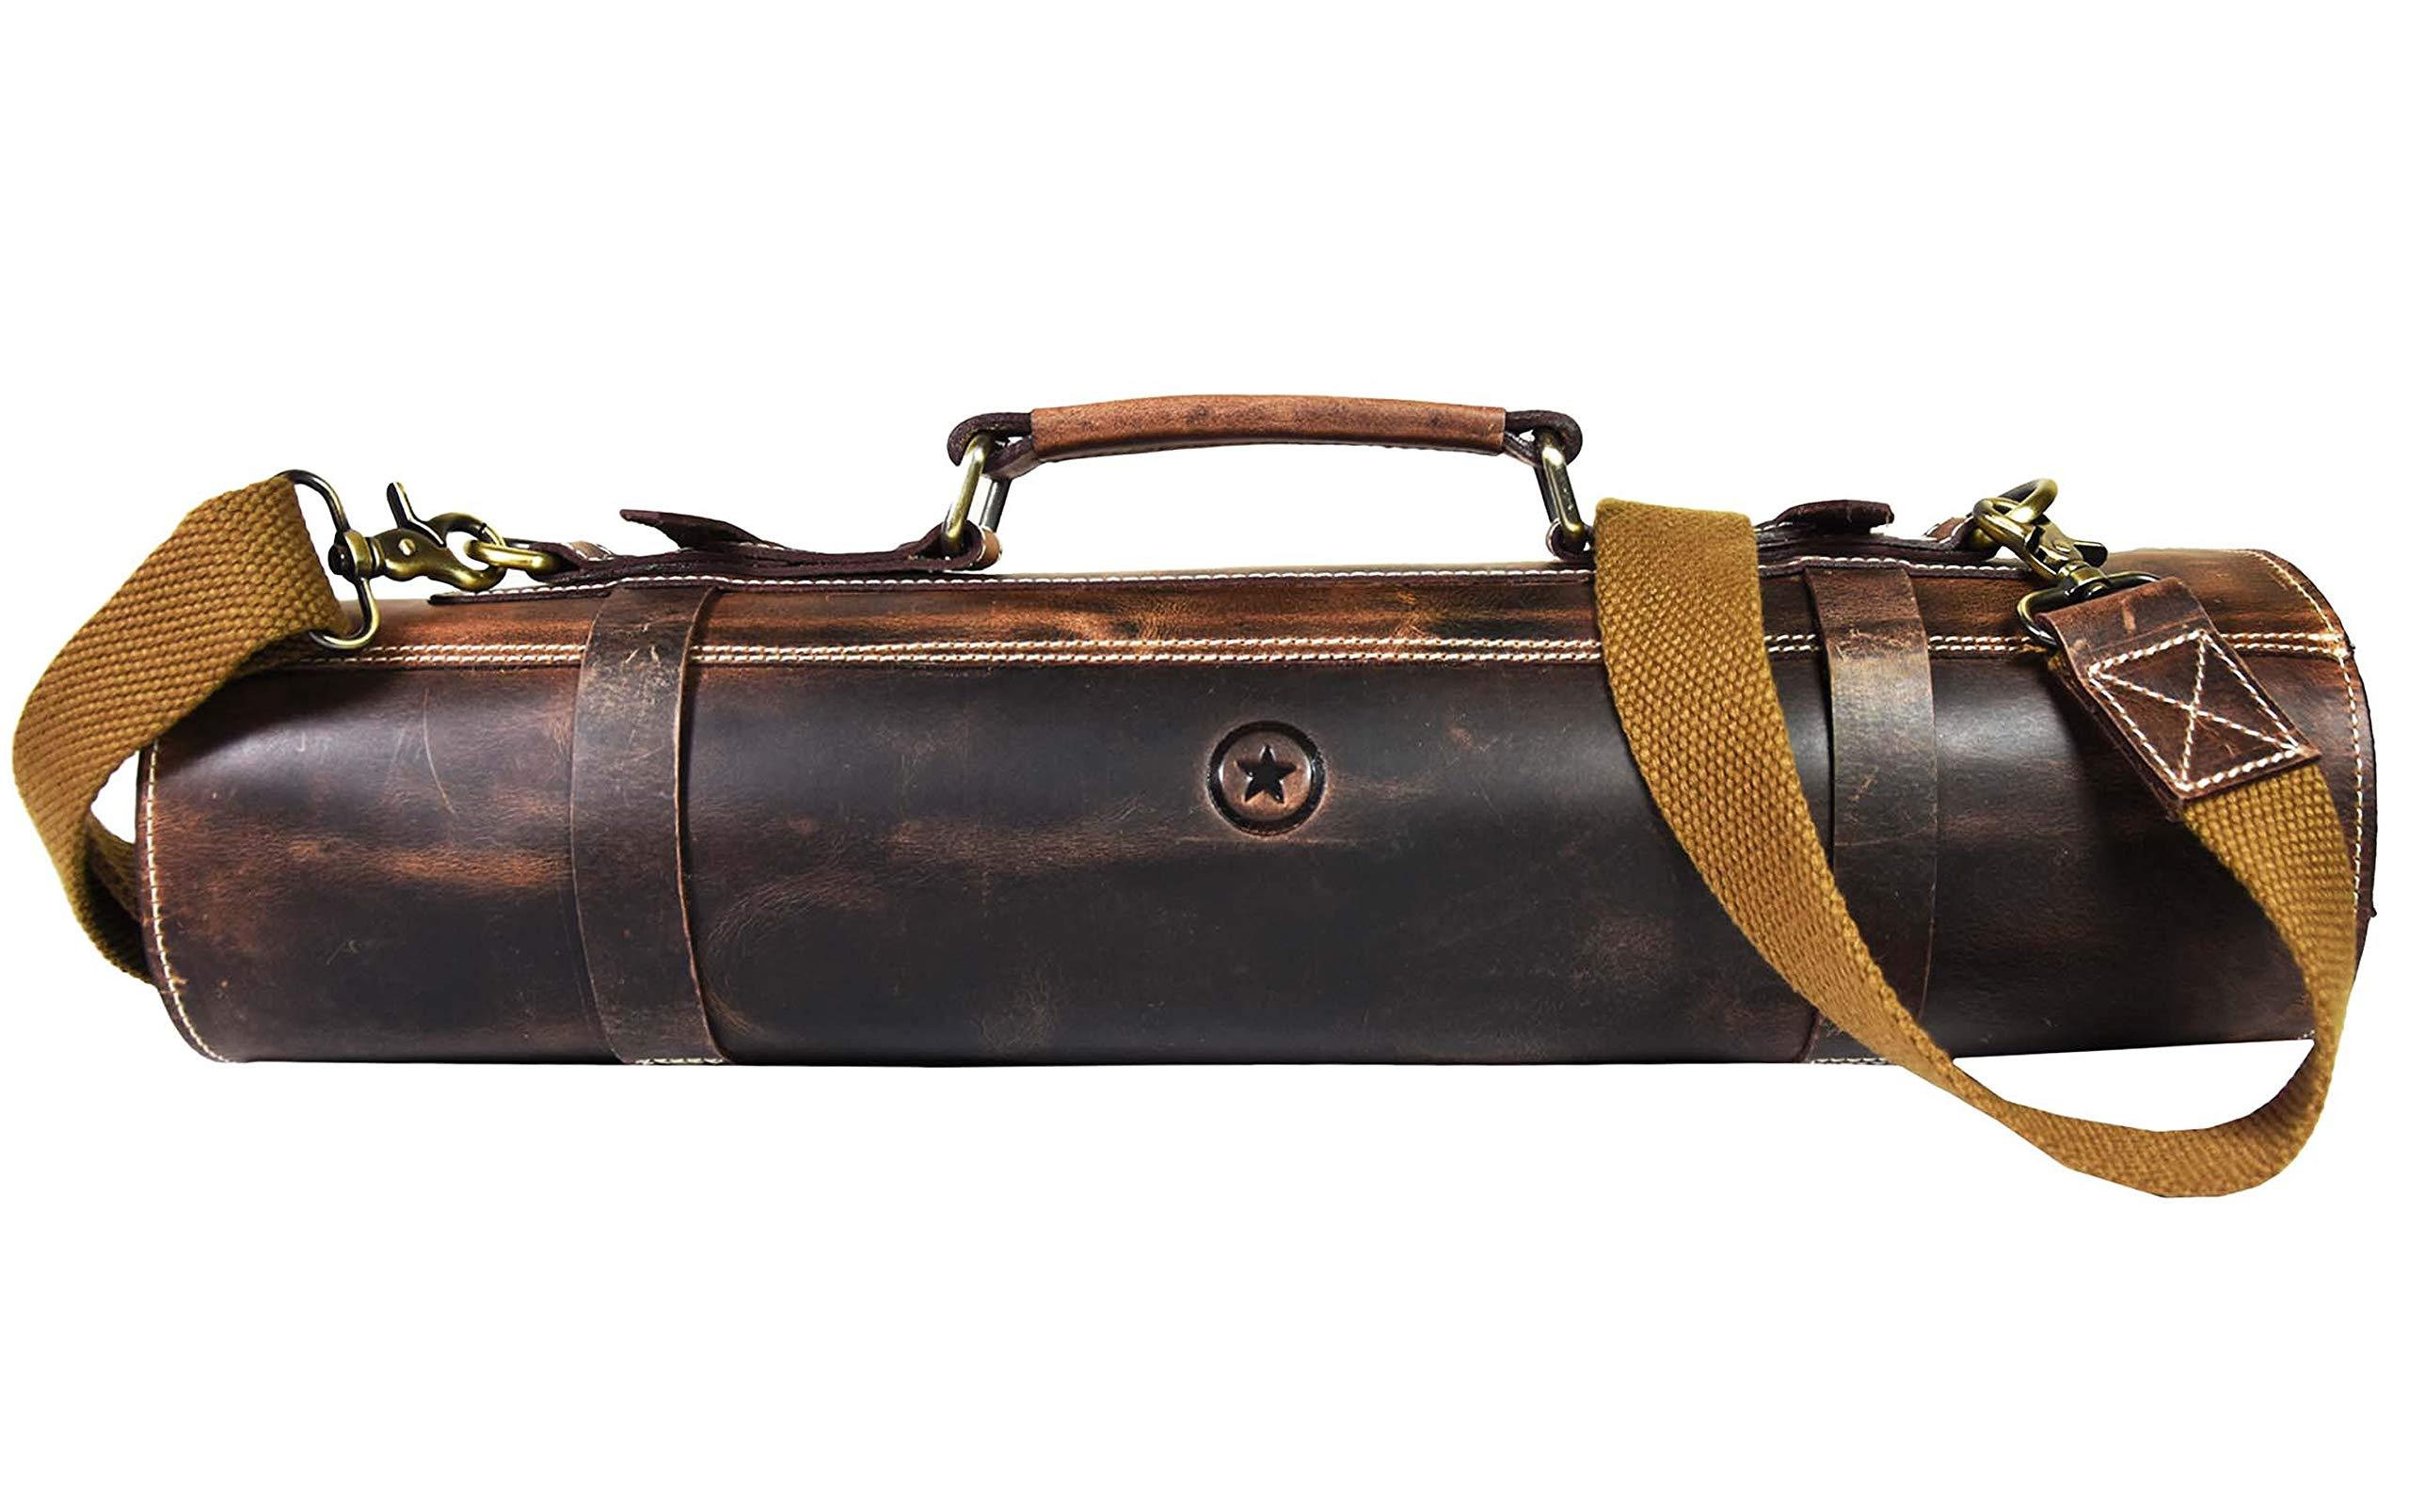 Leather Knife Roll Storage Bag   Elastic and Expandable 10 Pockets   Adjustable/Detachable Shoulder Strap   Travel-Friendly Chef Knife Case Roll By Aaron Leather (Walnut (Brown Lining), Leather) by AARON LEATHER GOODS VENDIMIA ESTILO